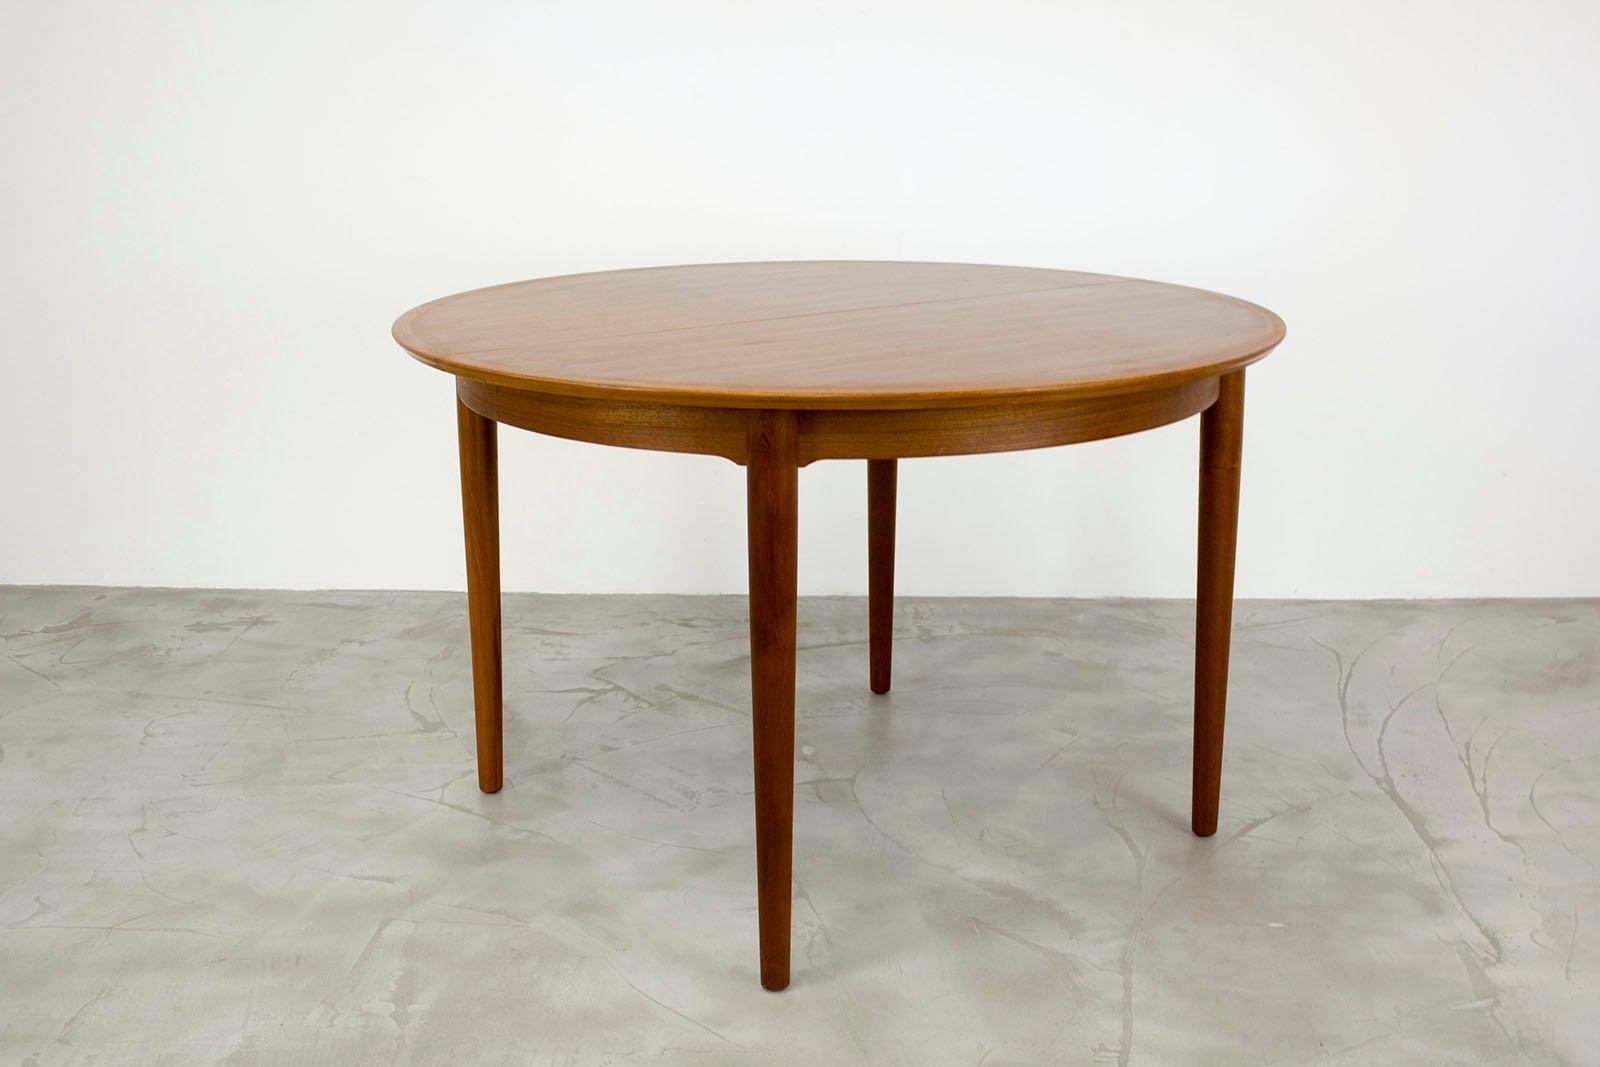 Table de salle manger en teck avec rallonge abattant for Table salle a manger teck avec rallonges